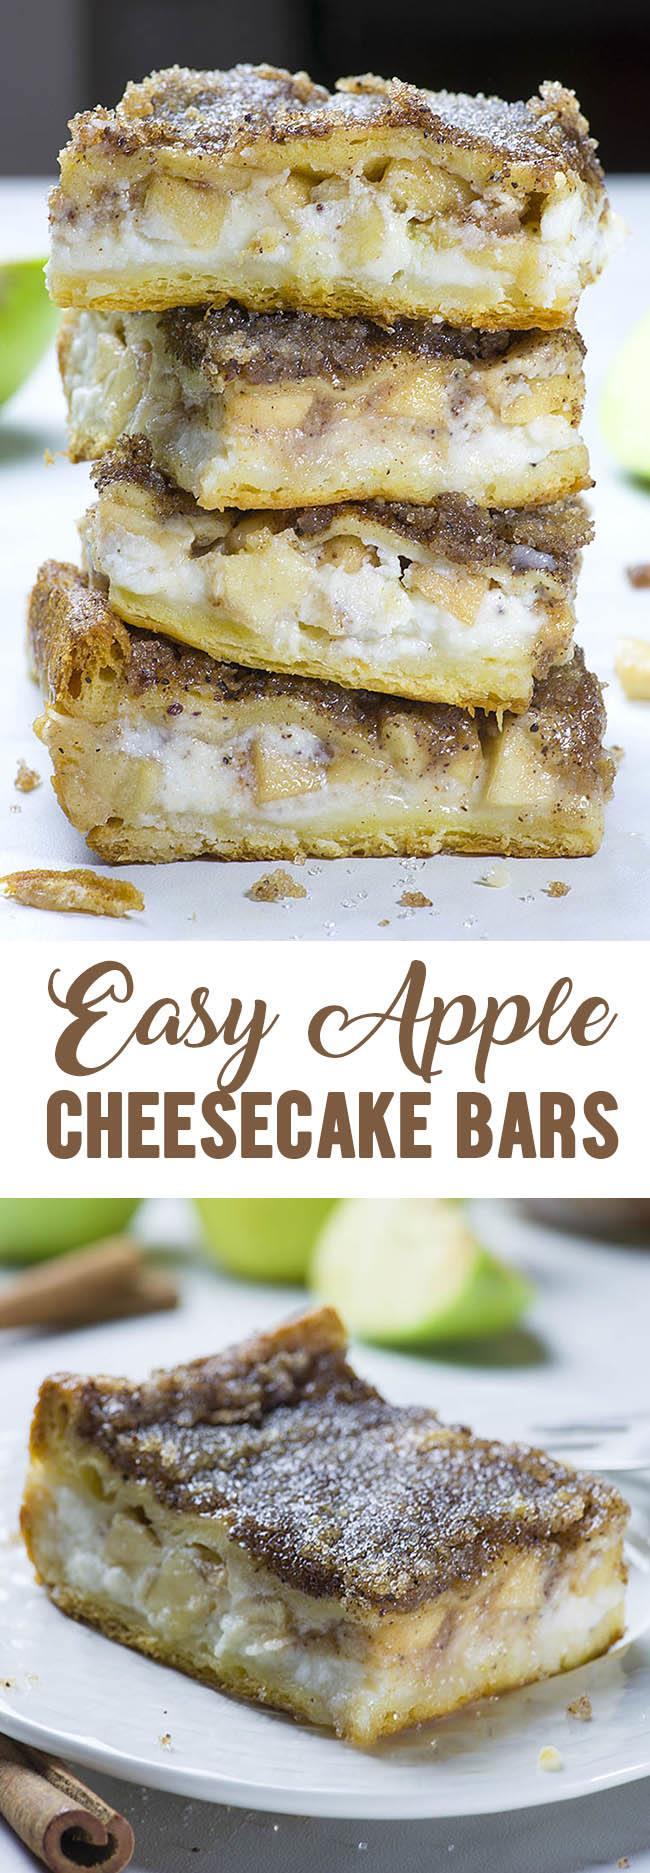 Simple Casserole Recipes Crescent Rolls